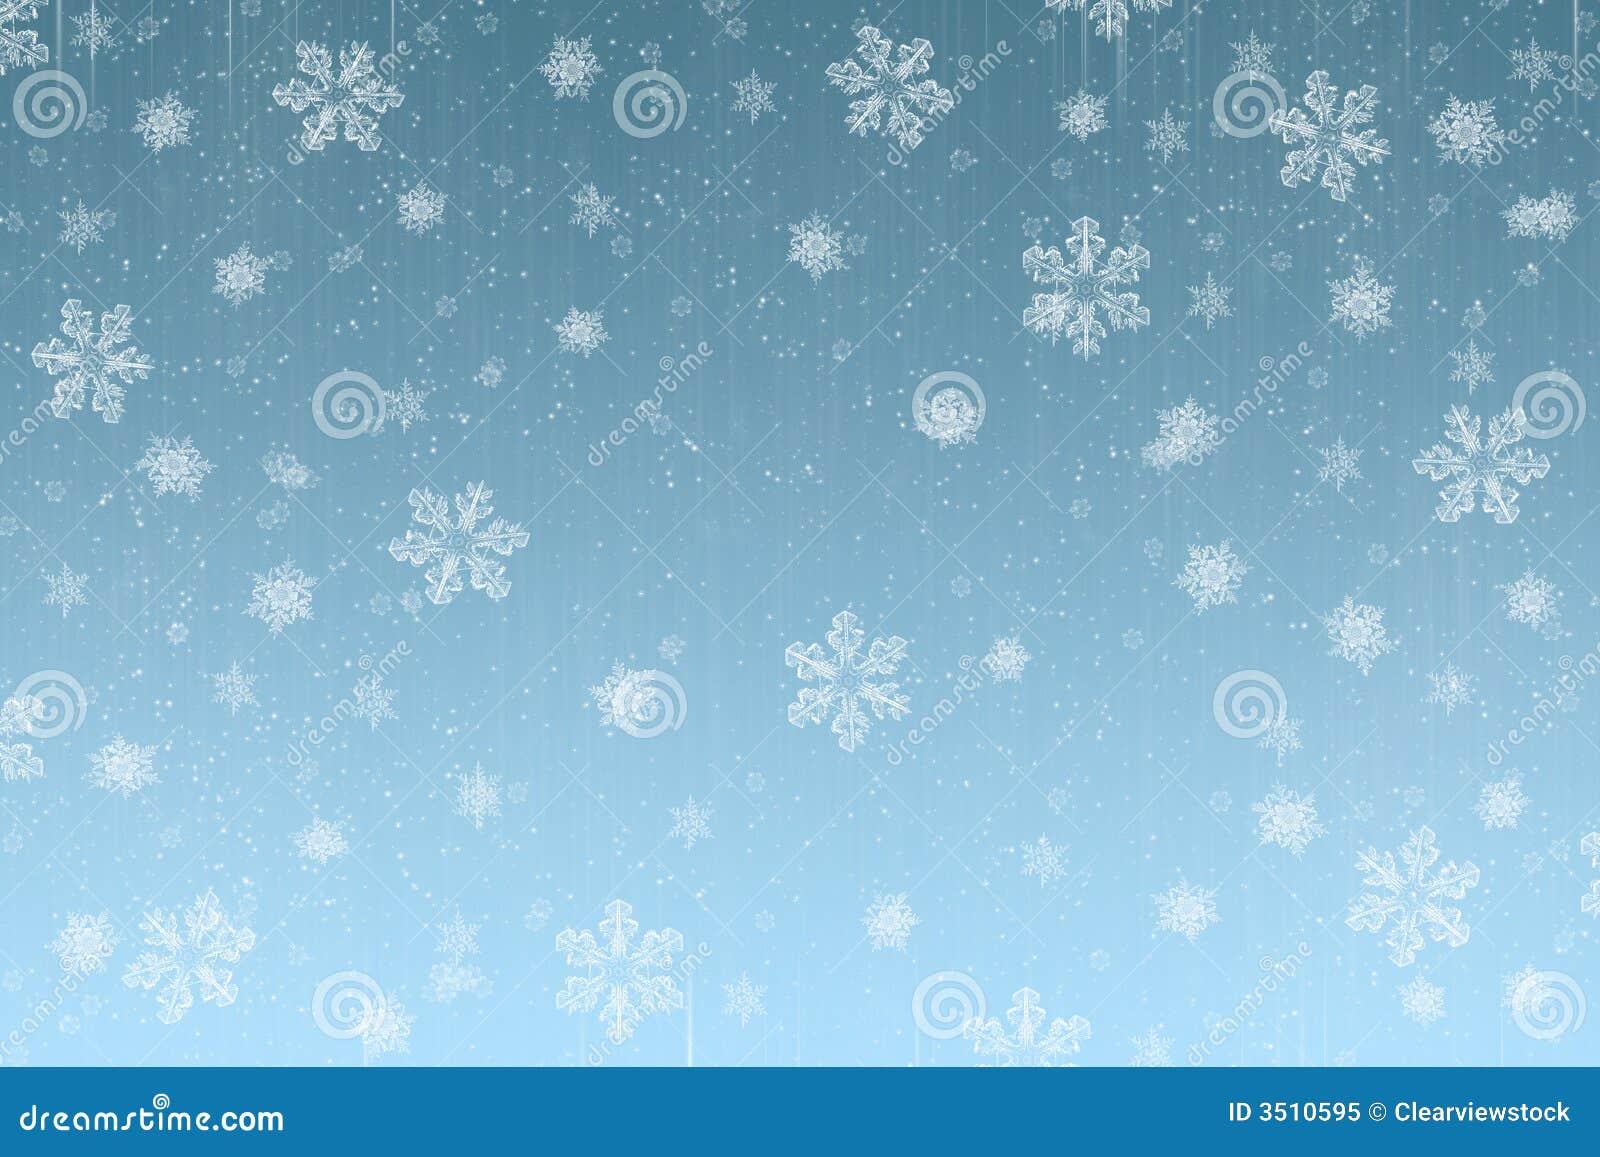 Christmas Snow Scene Card Royalty Free Stock Photo - Image: 3510595